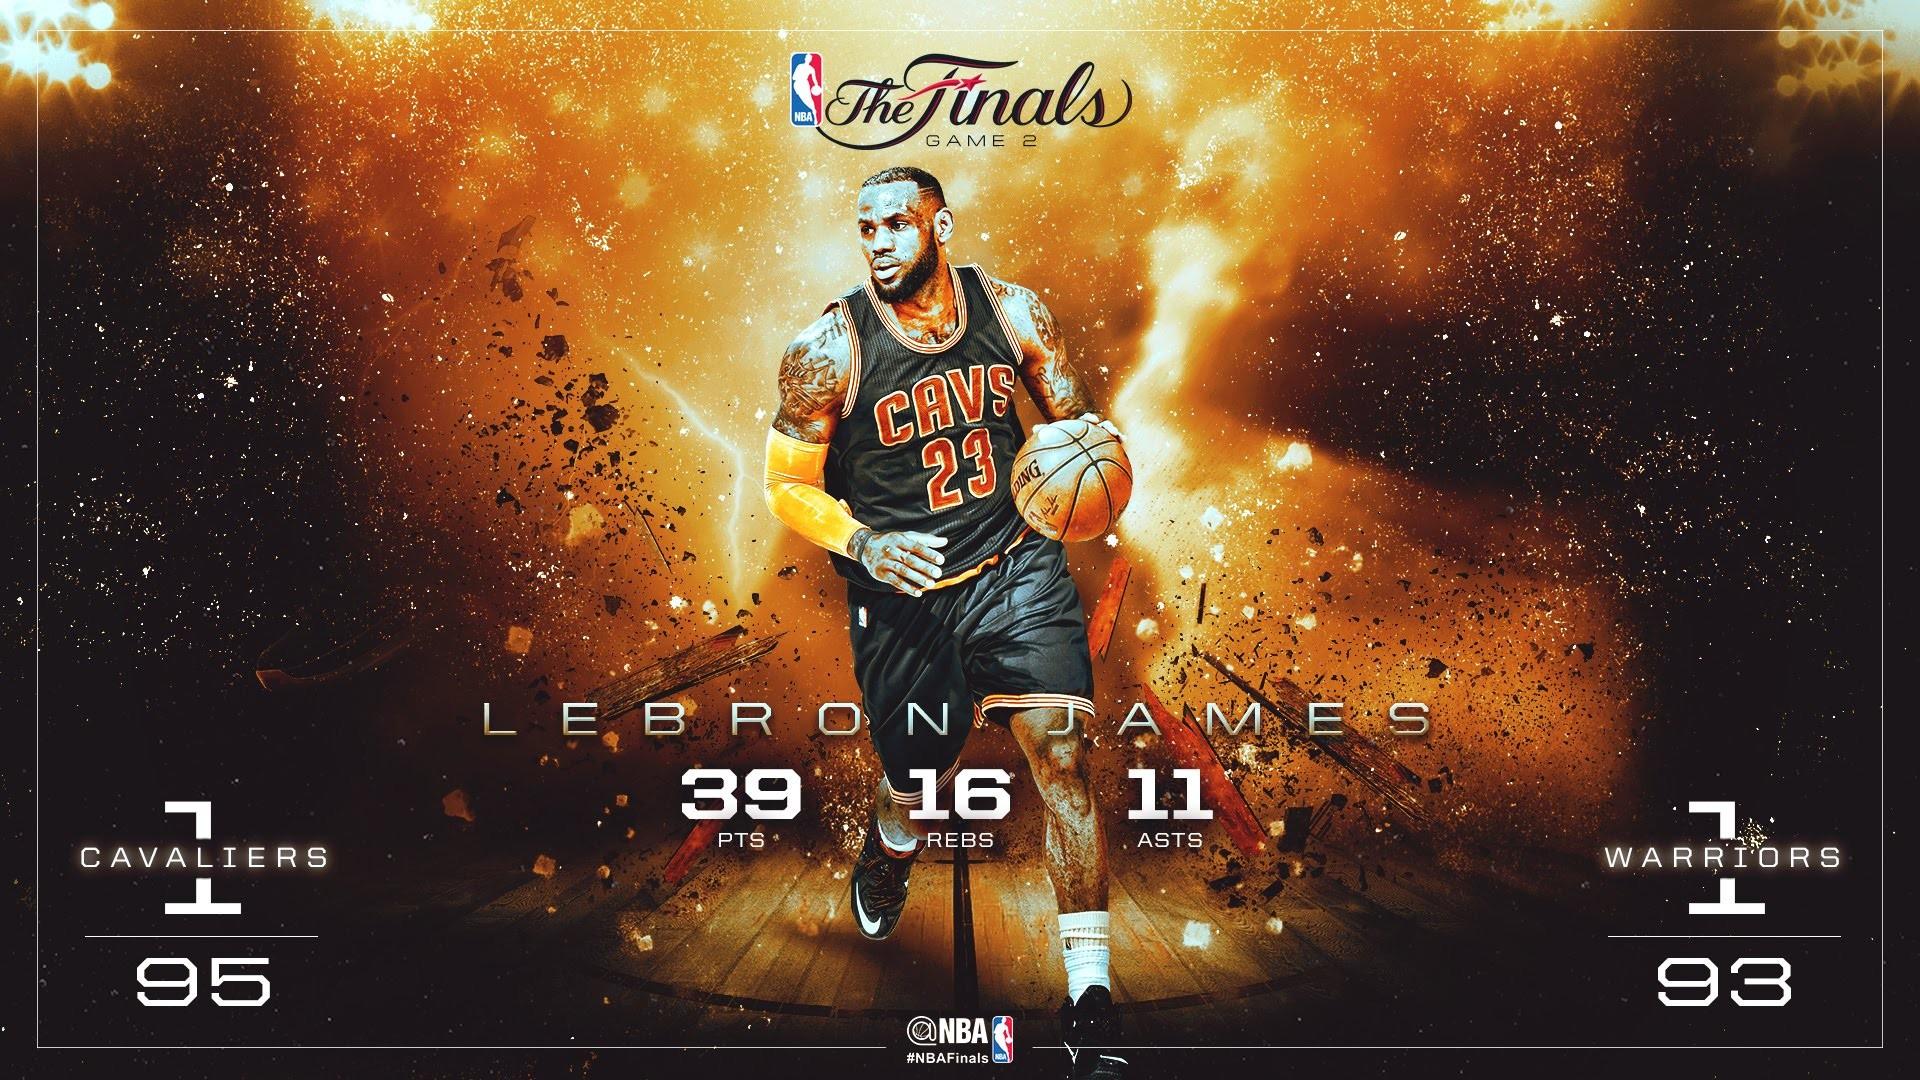 Res: 1920x1080, #NBA #NBAFinals 2015 NBA Finals: Game 2 Minimovie